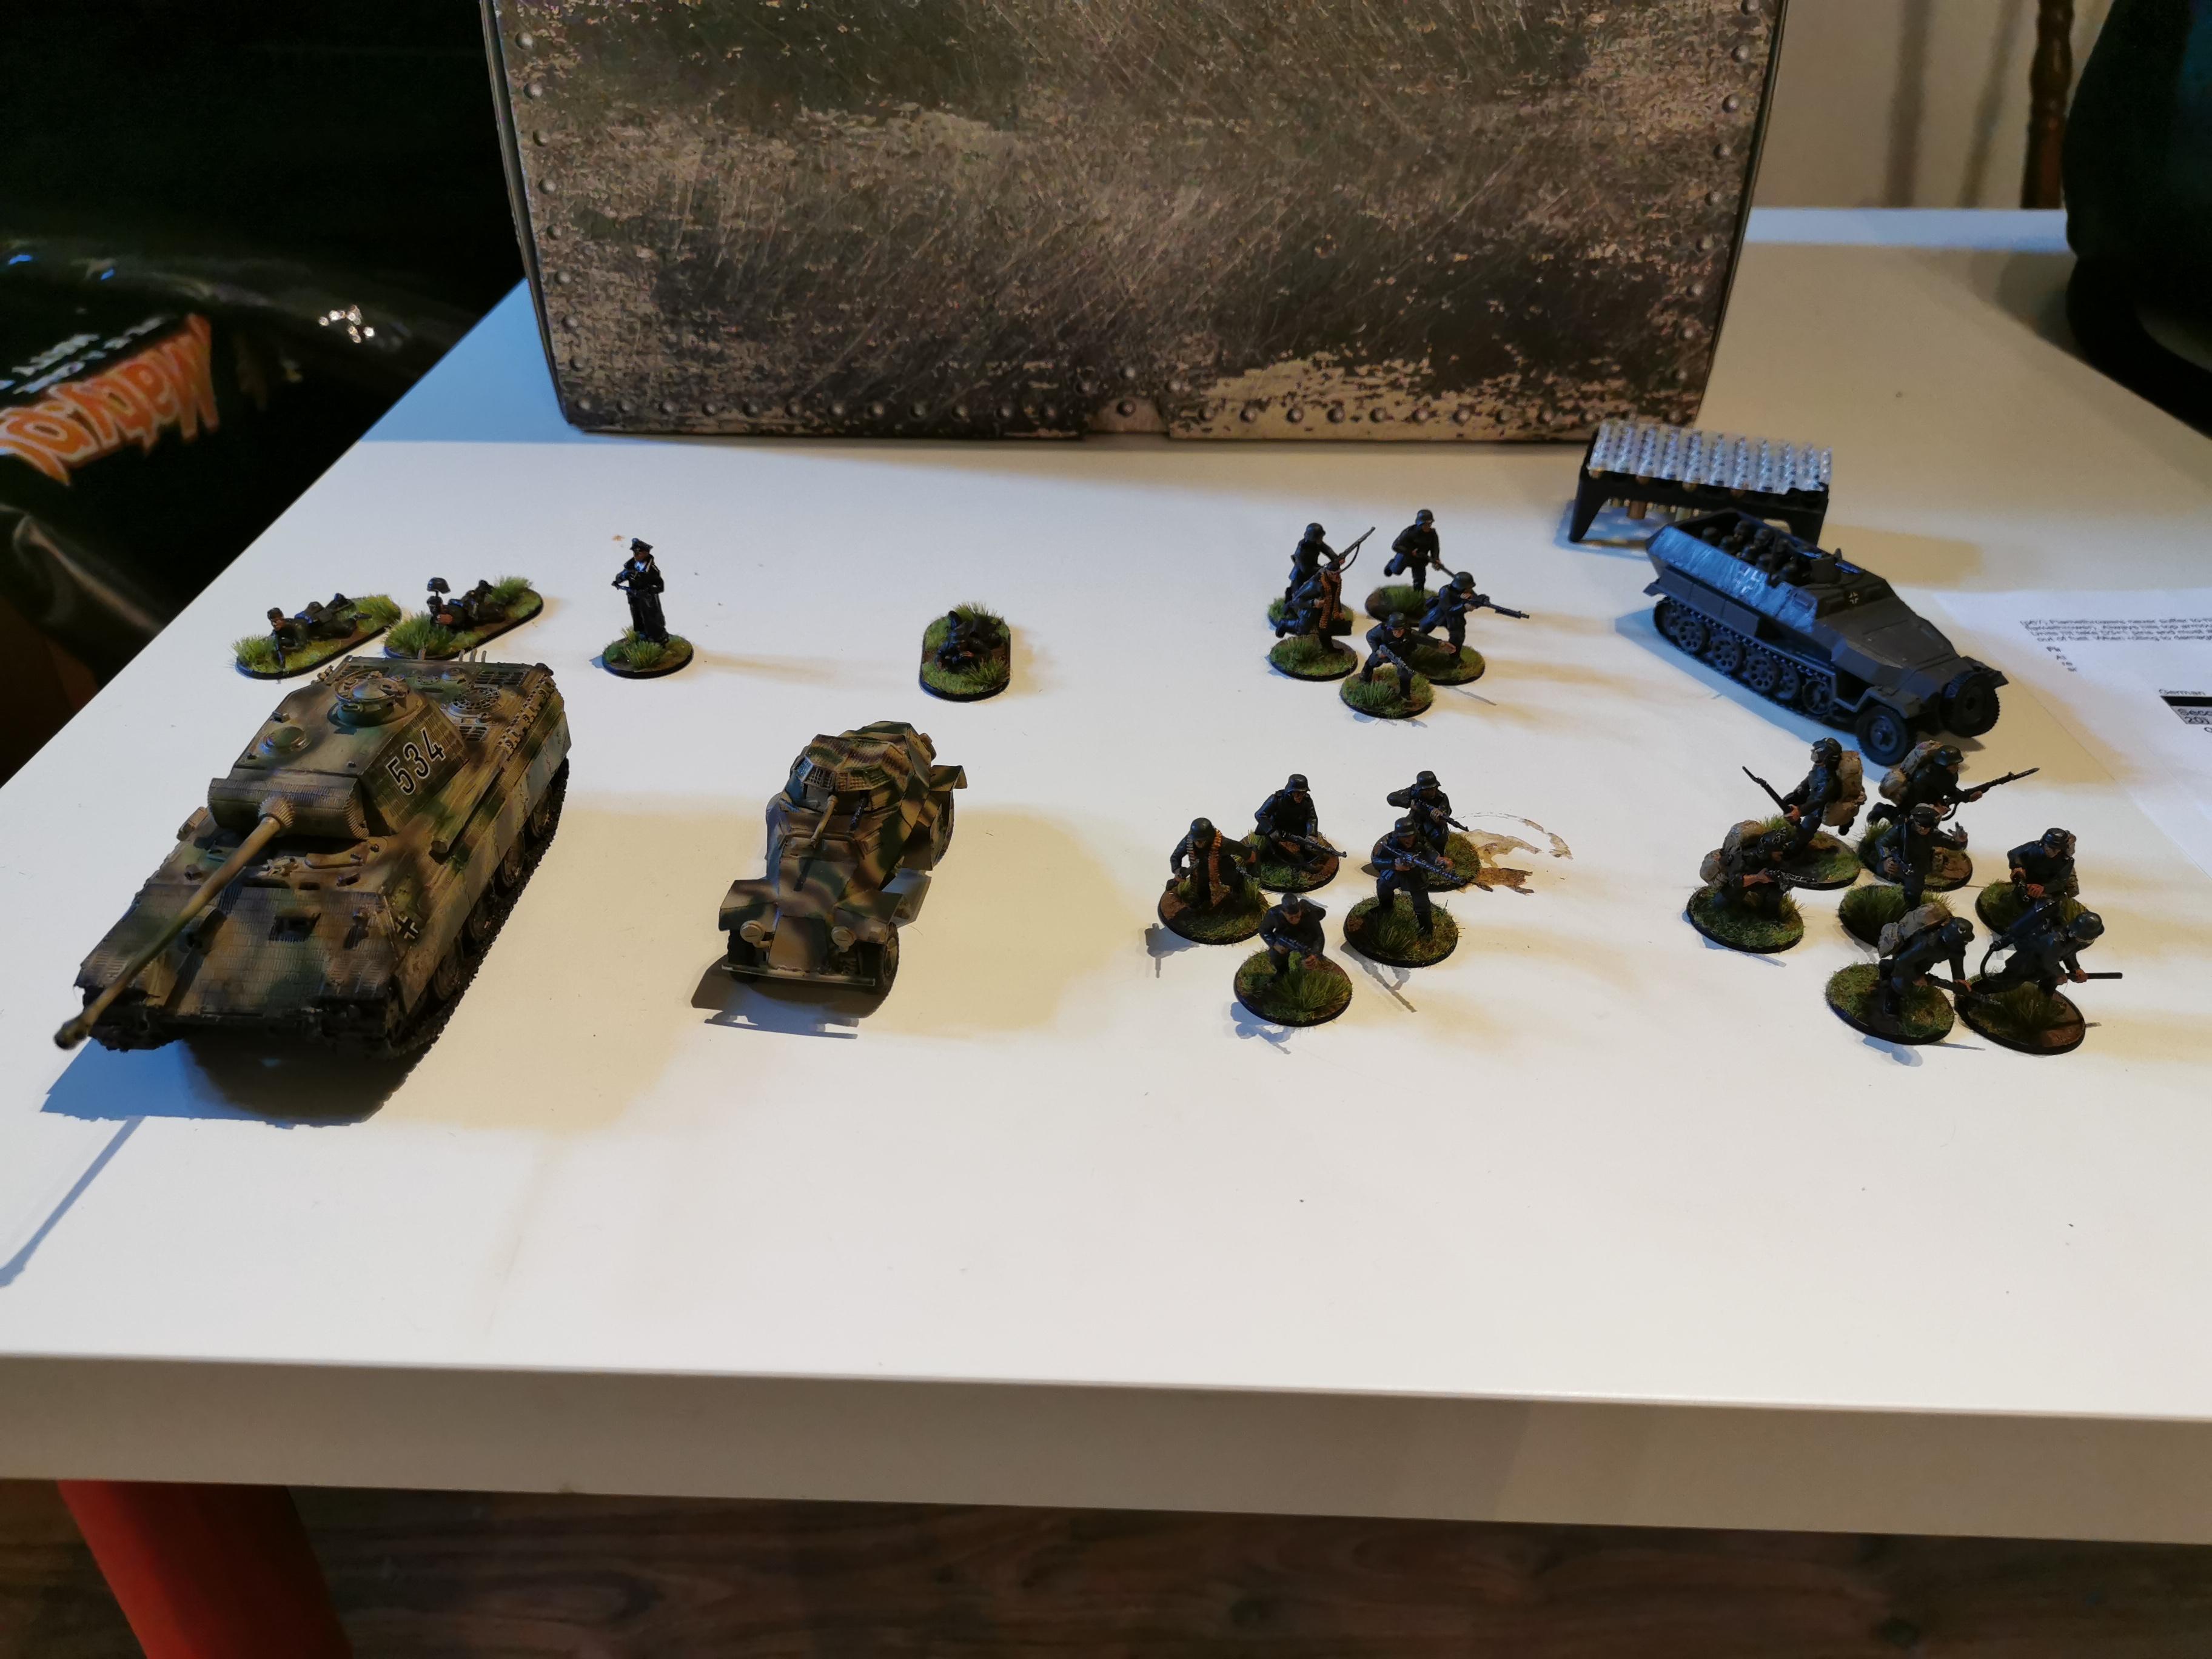 21th Panzer Division versus Regina Rifles in a fierce infantry engagement